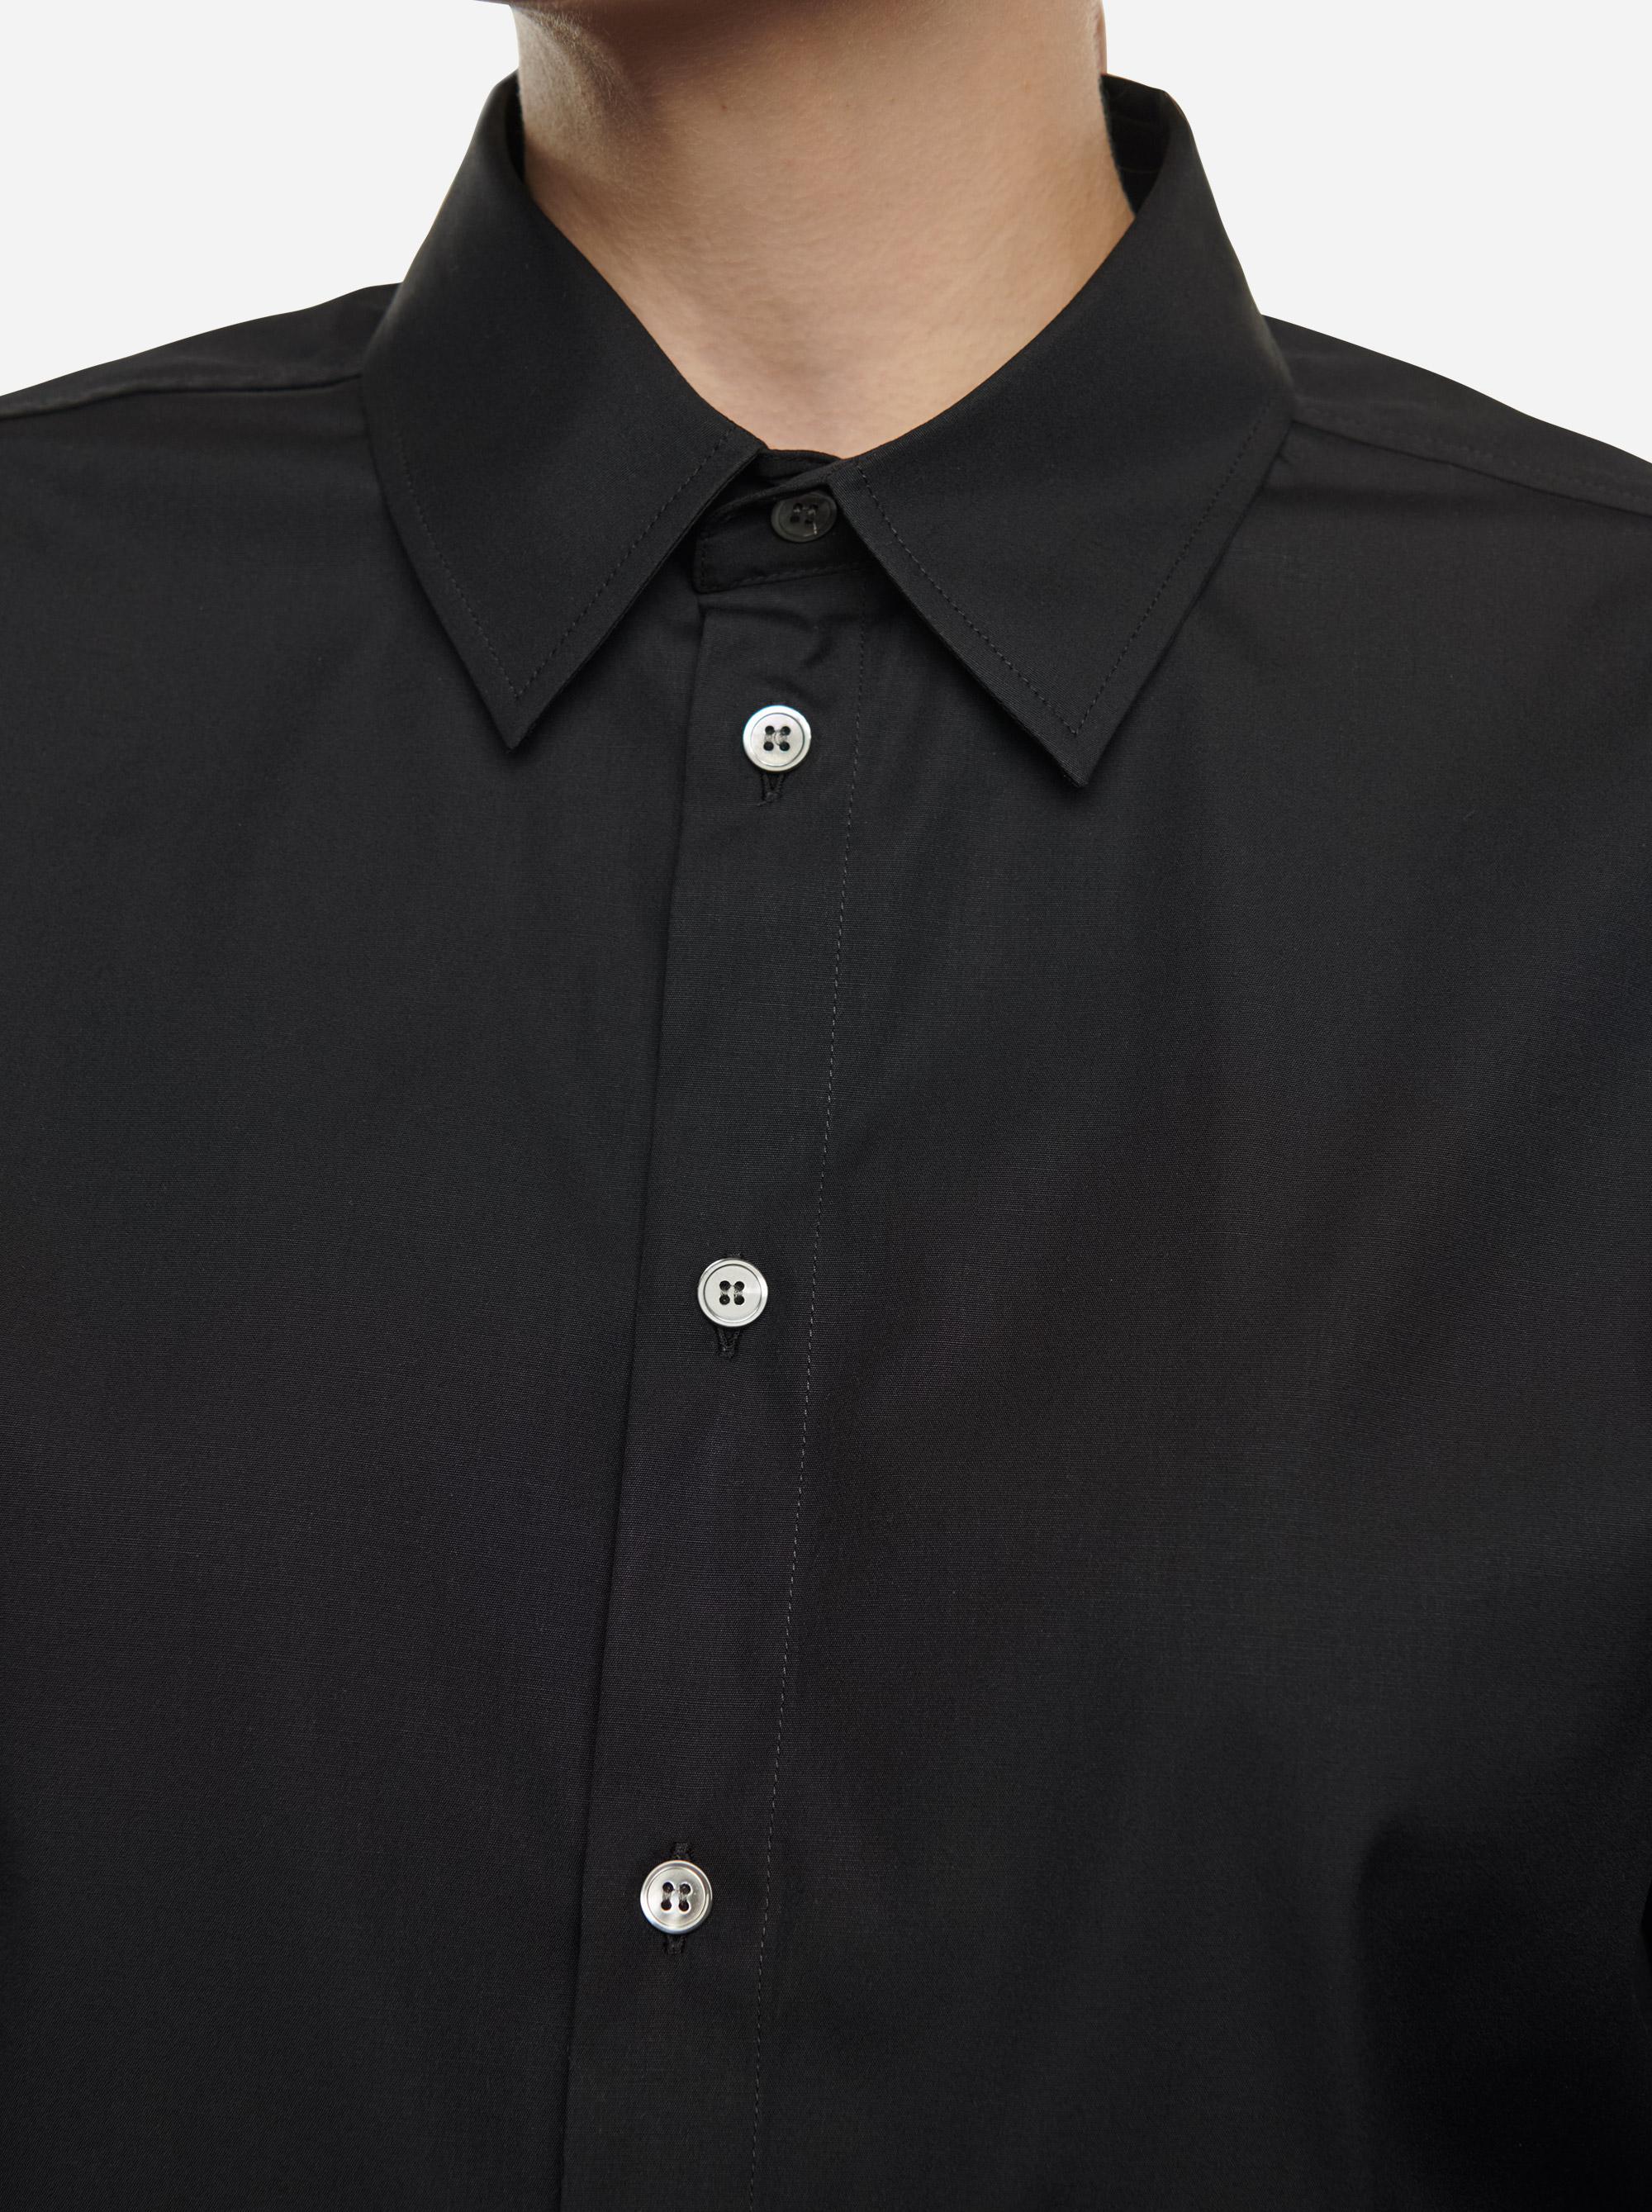 Teym-Shirt-Black-women-3